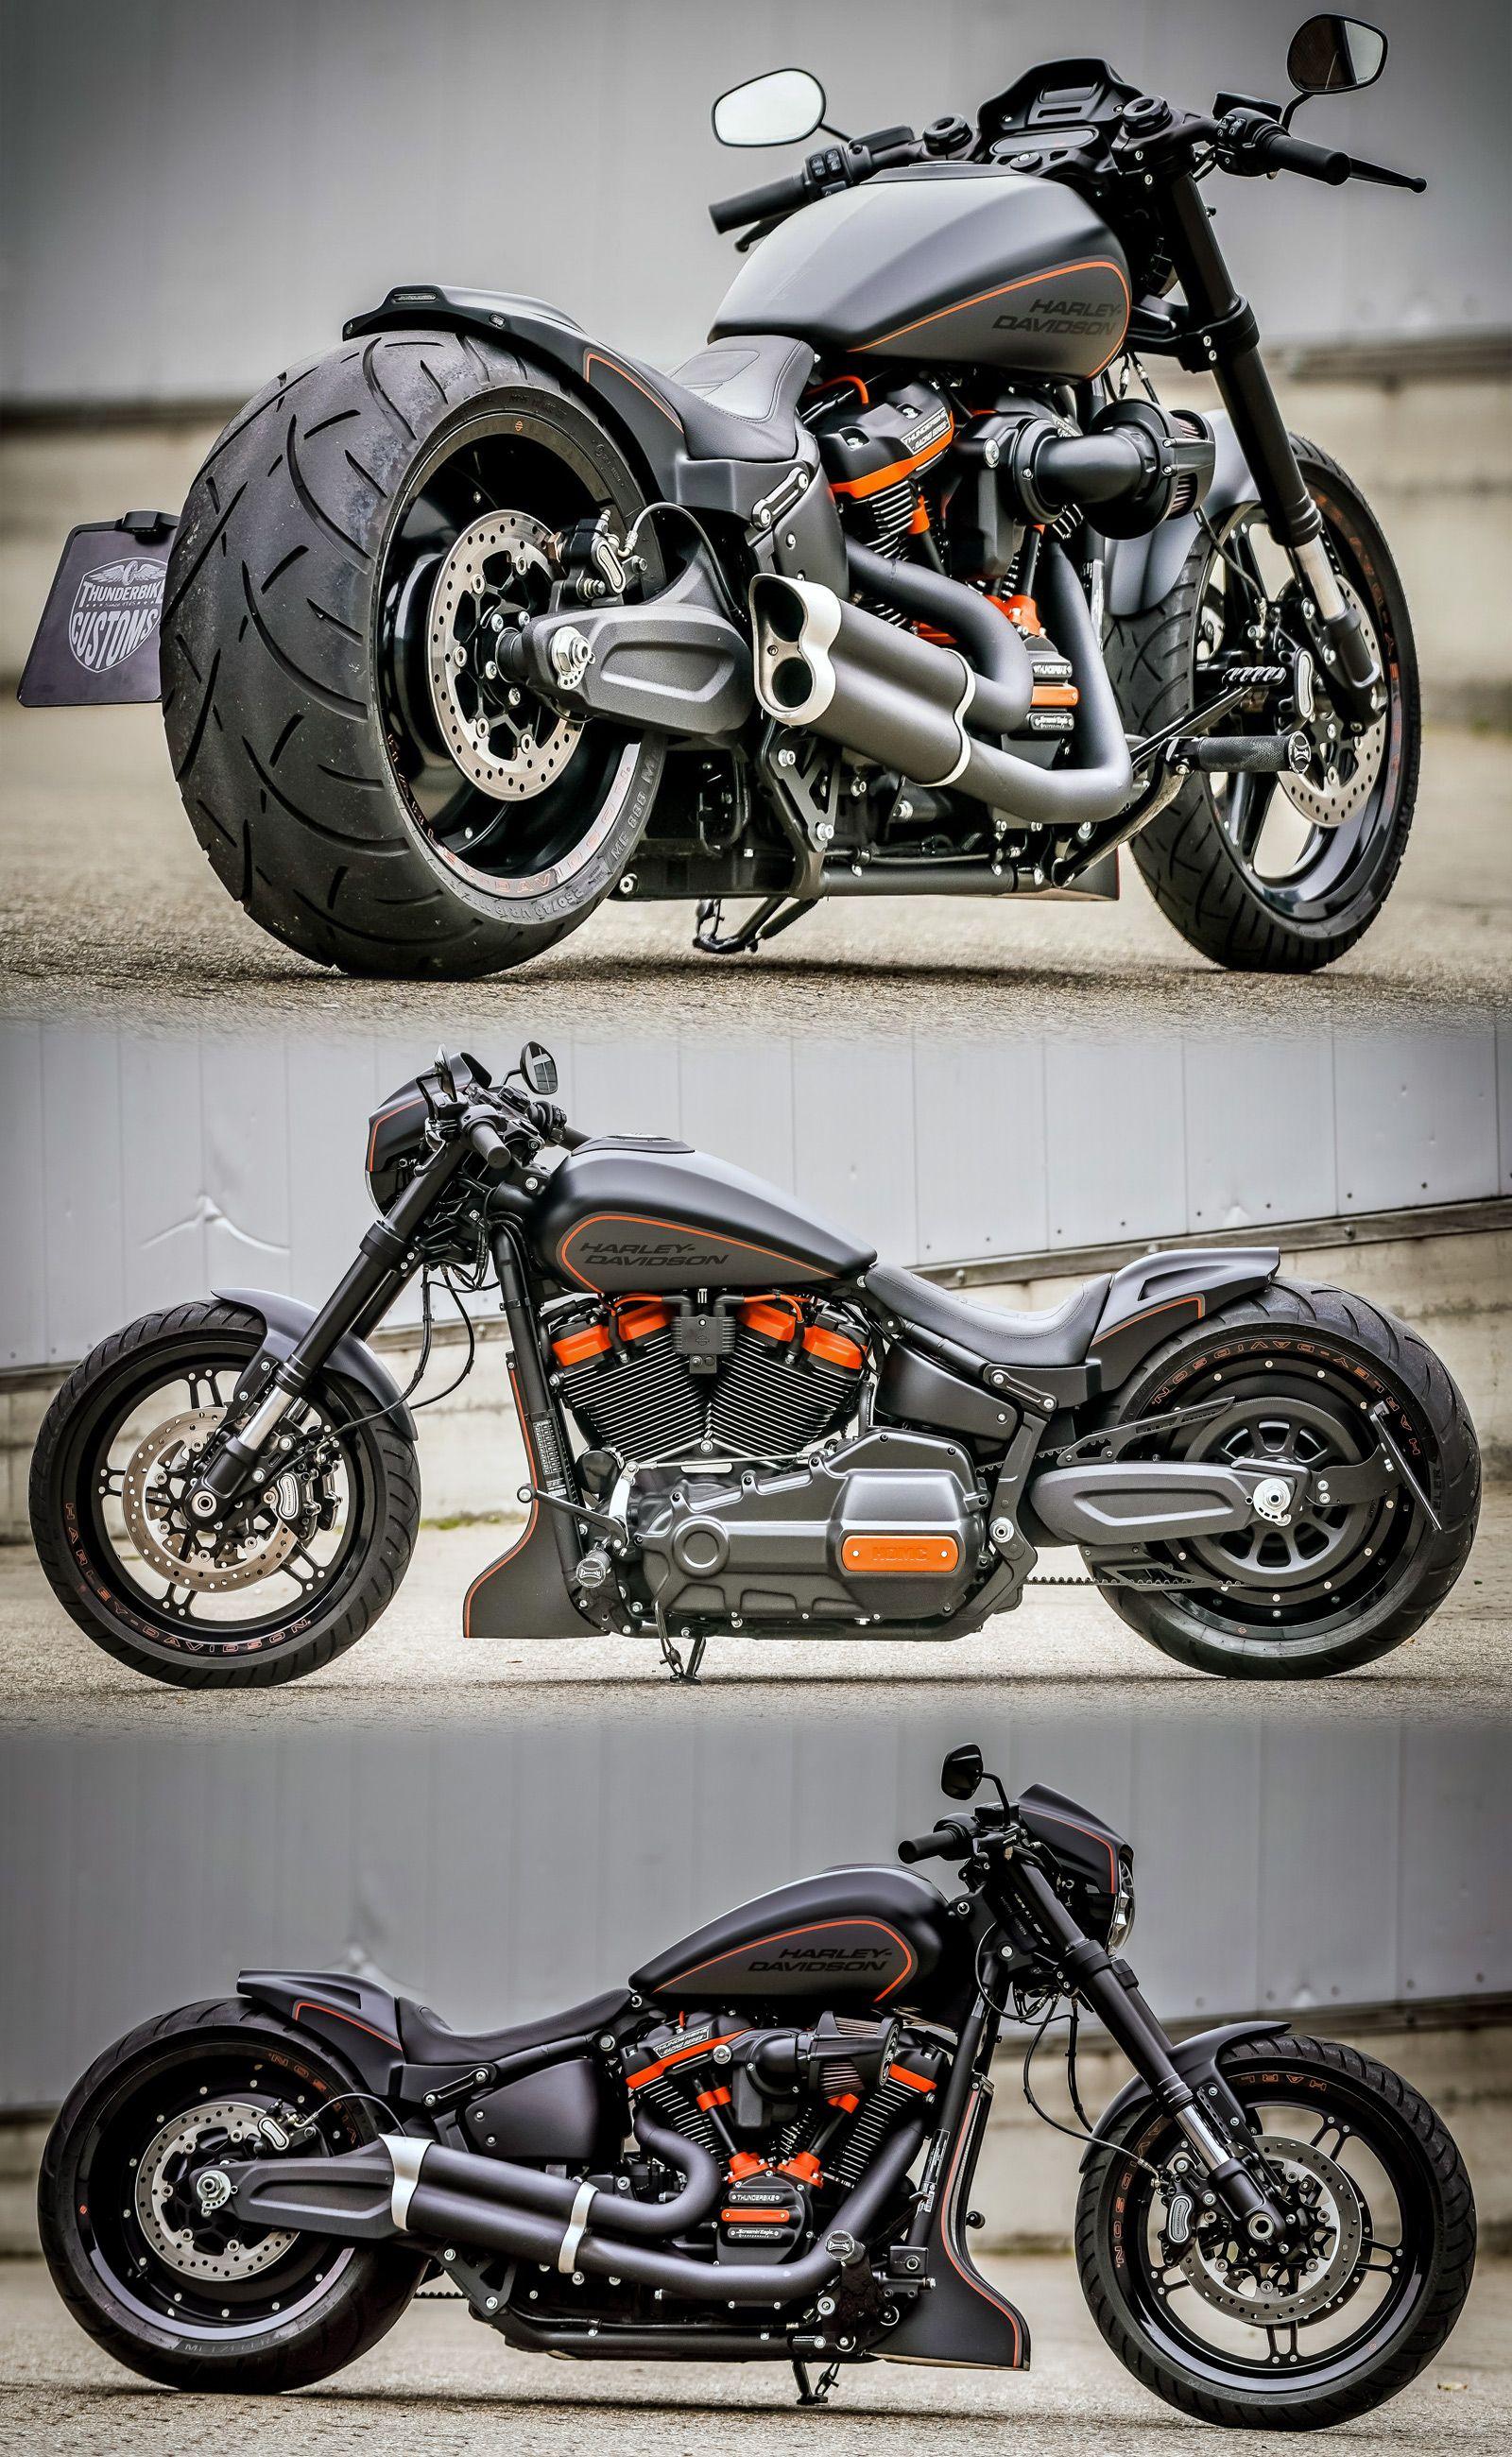 Thunderbike Harley-Davidson FXDR Custom Motorcycle Dragster Style   Custom motorcycles  harley, Bobber motorcycle, Harley bikes